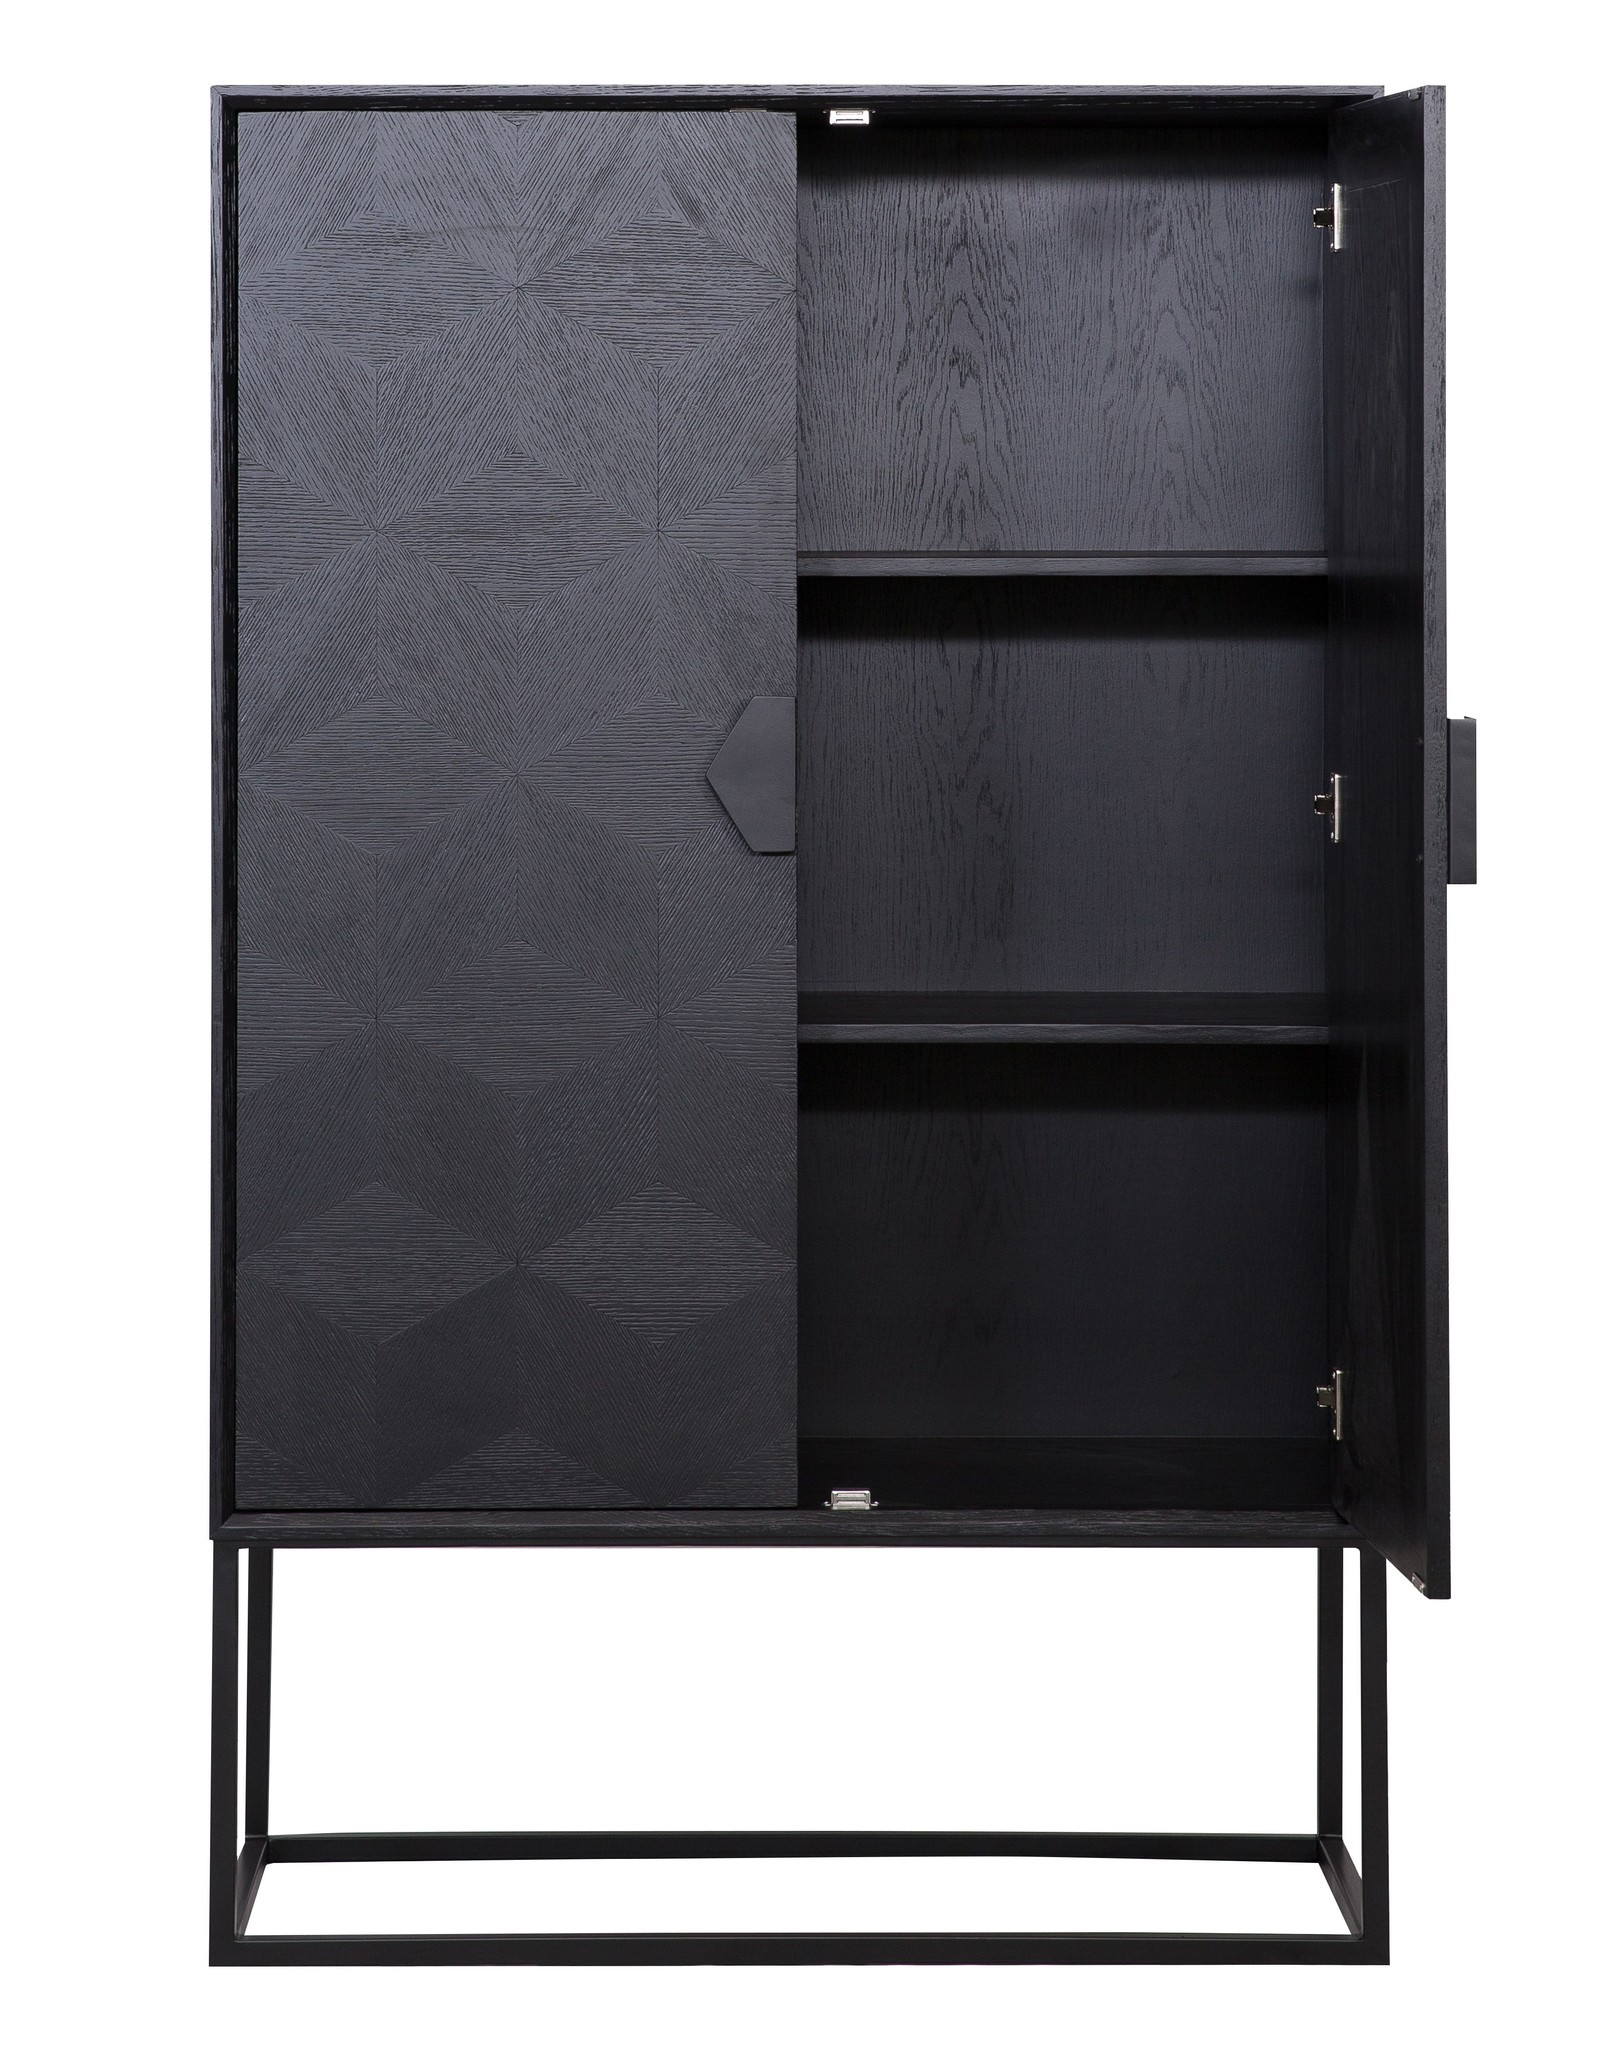 Richmond Interiors Wandkast Blax 2 deurs zwart